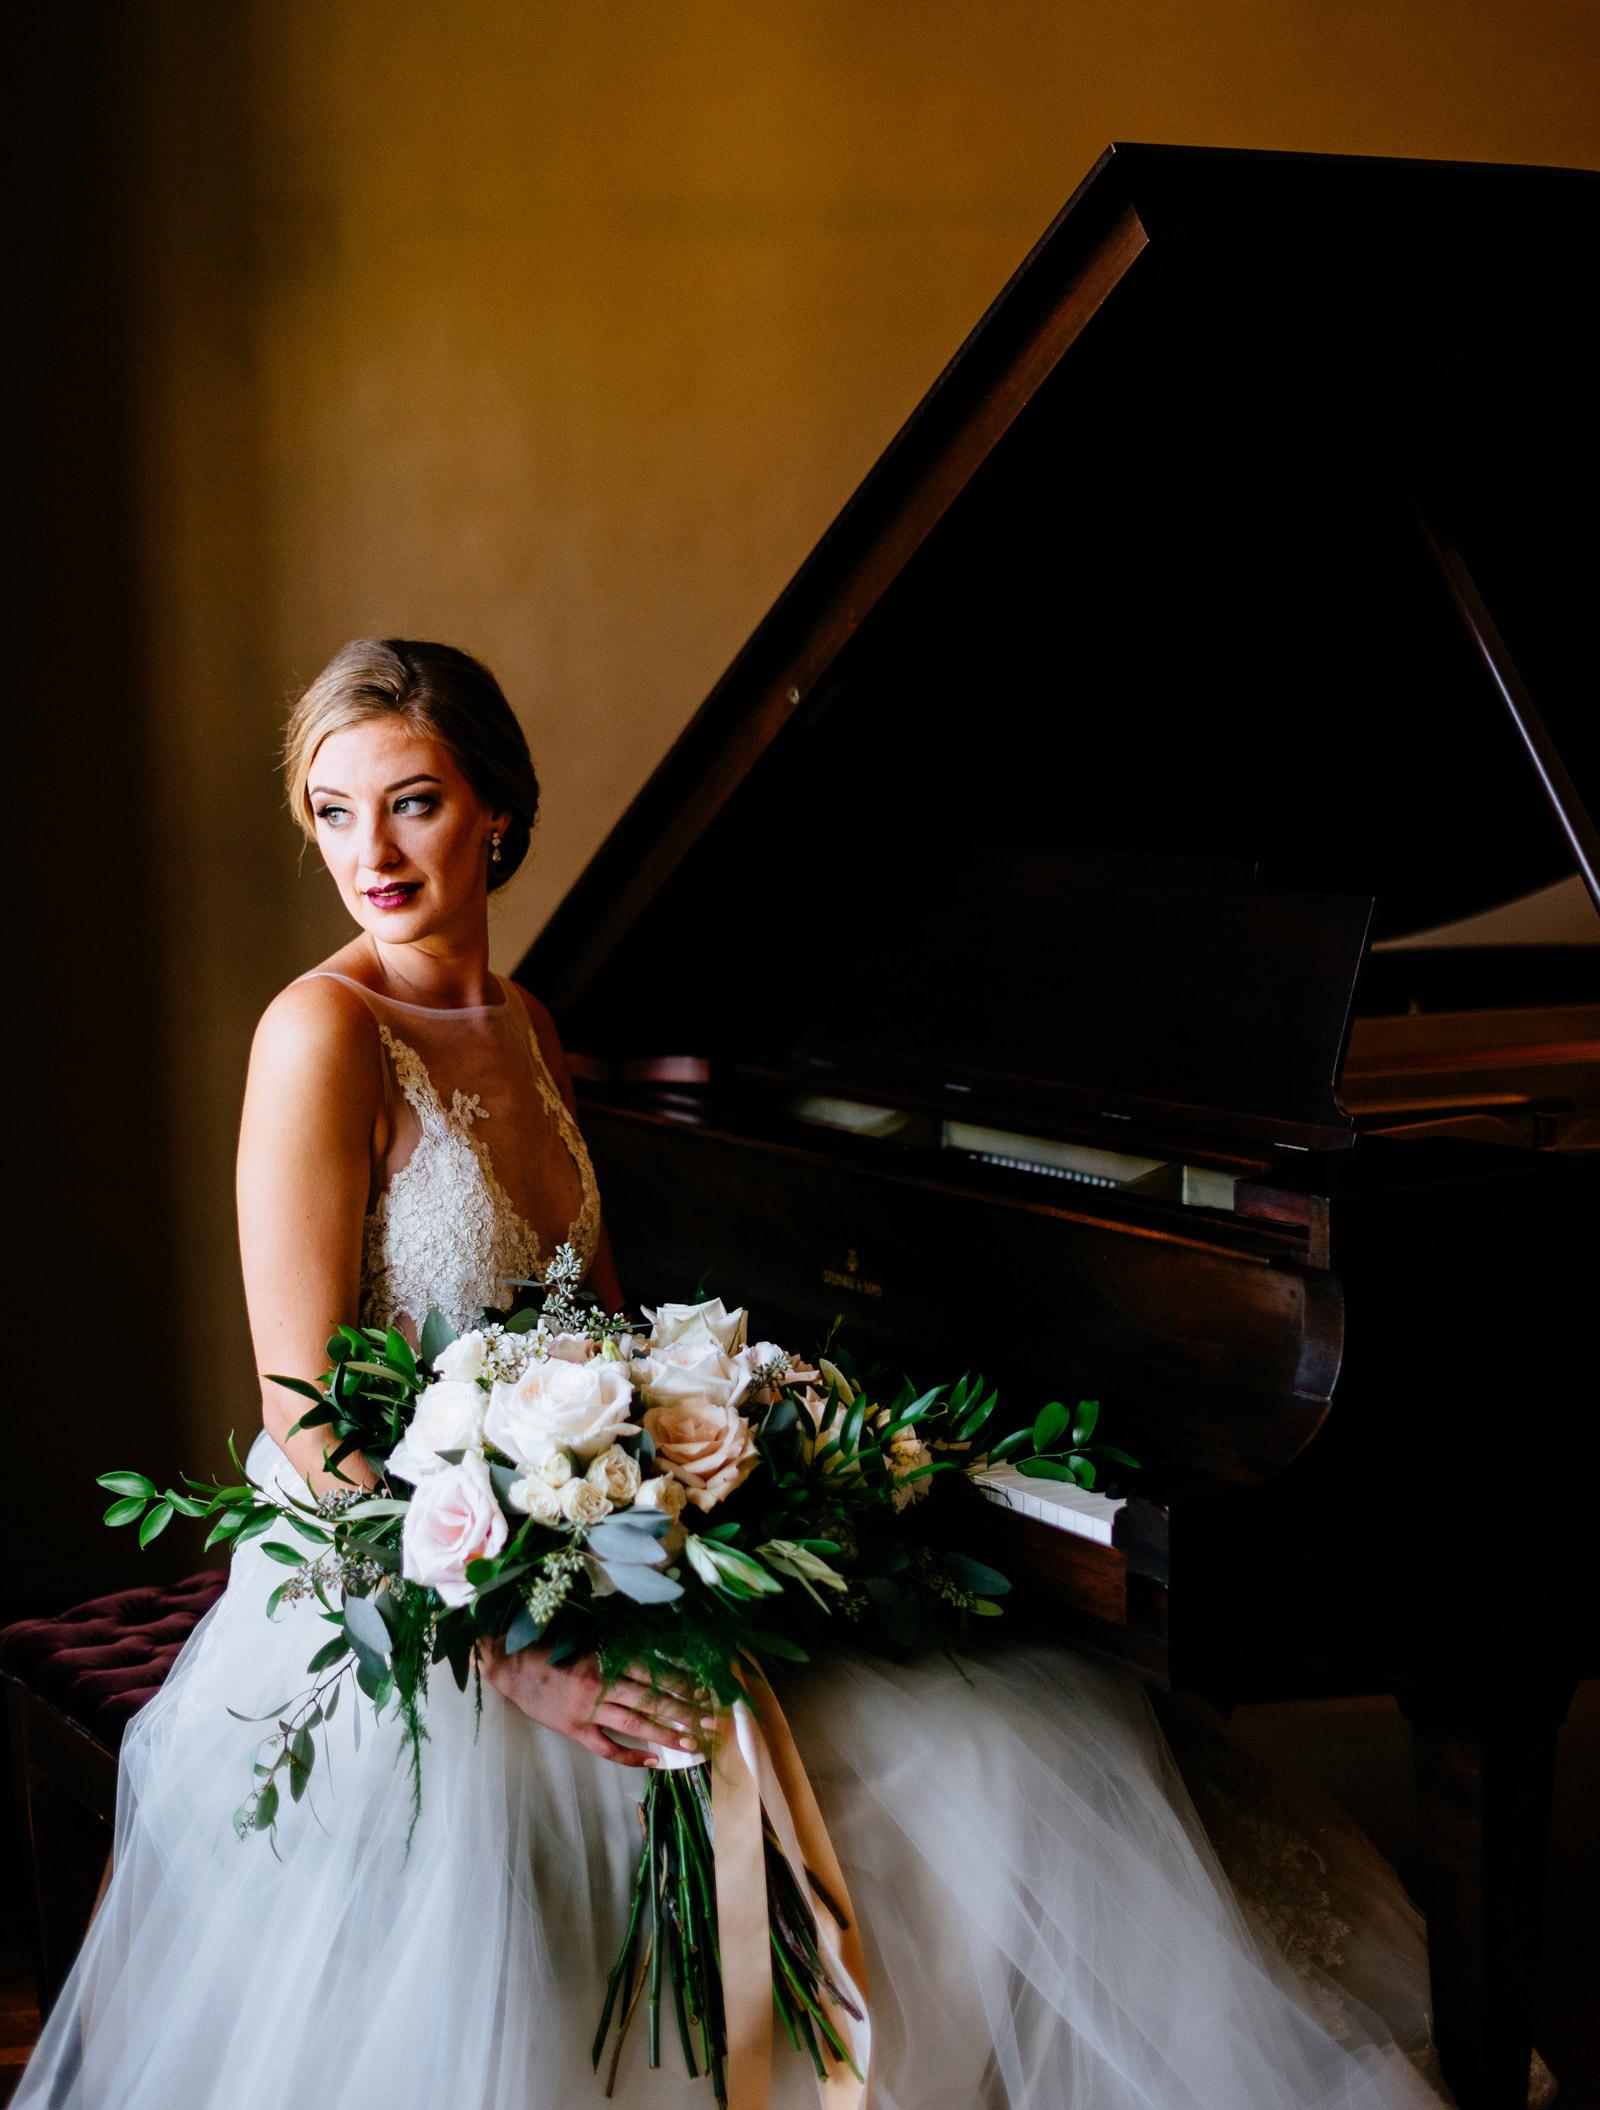 bridal portrait with piano